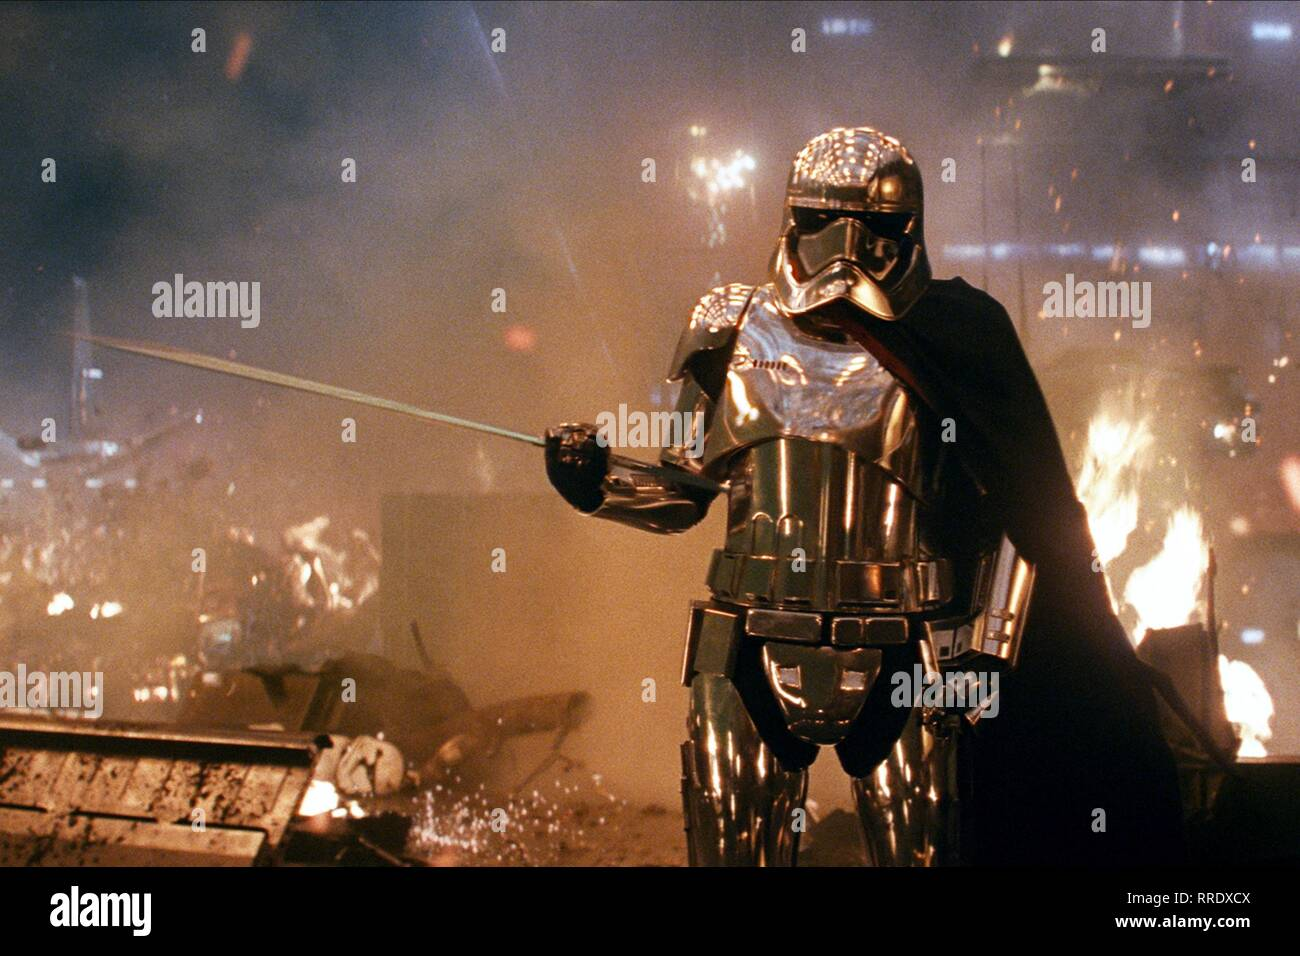 STAR WARS: THE LAST JEDI, GWENDOLINE CHRISTIE, 2017 - Stock Image